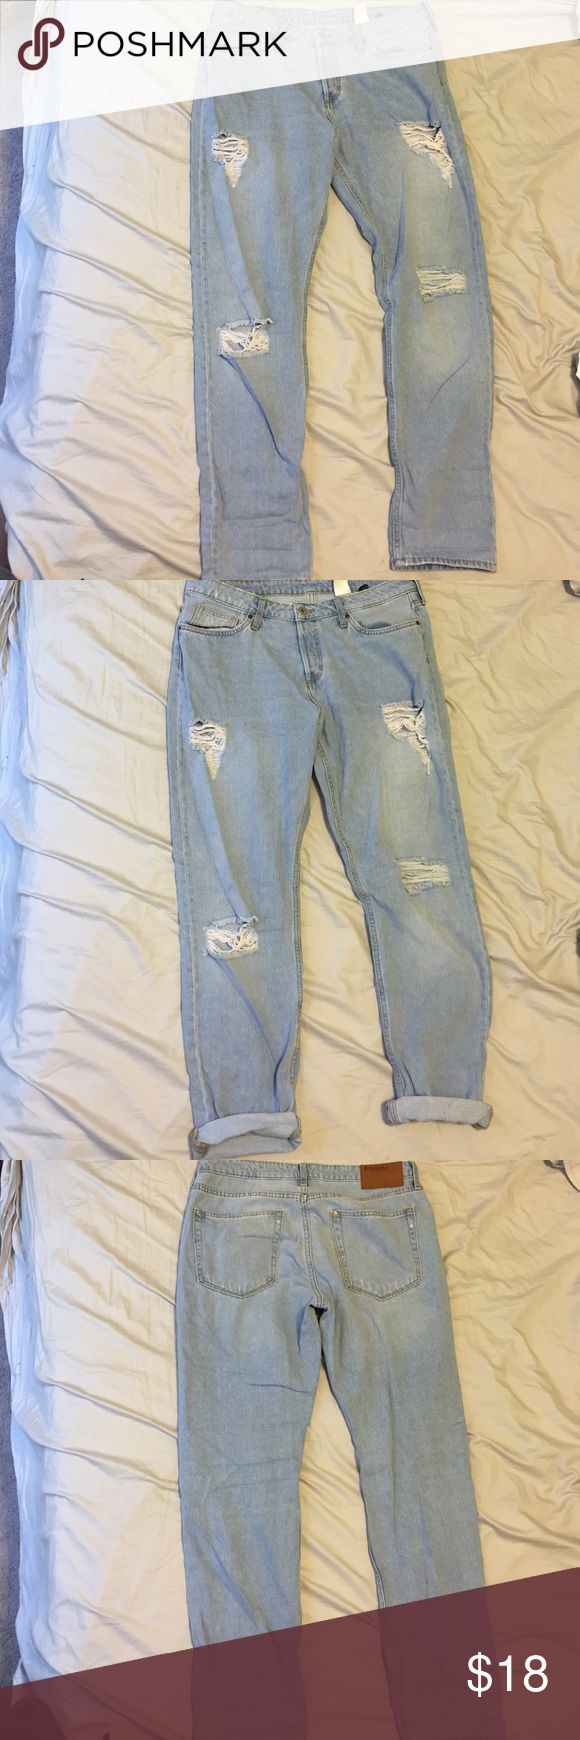 New H&M Ripped Boyfriend Jean New without tags denim boyfriend Jean with rips. Low waist tapered leg. H&M Jeans Boyfriend